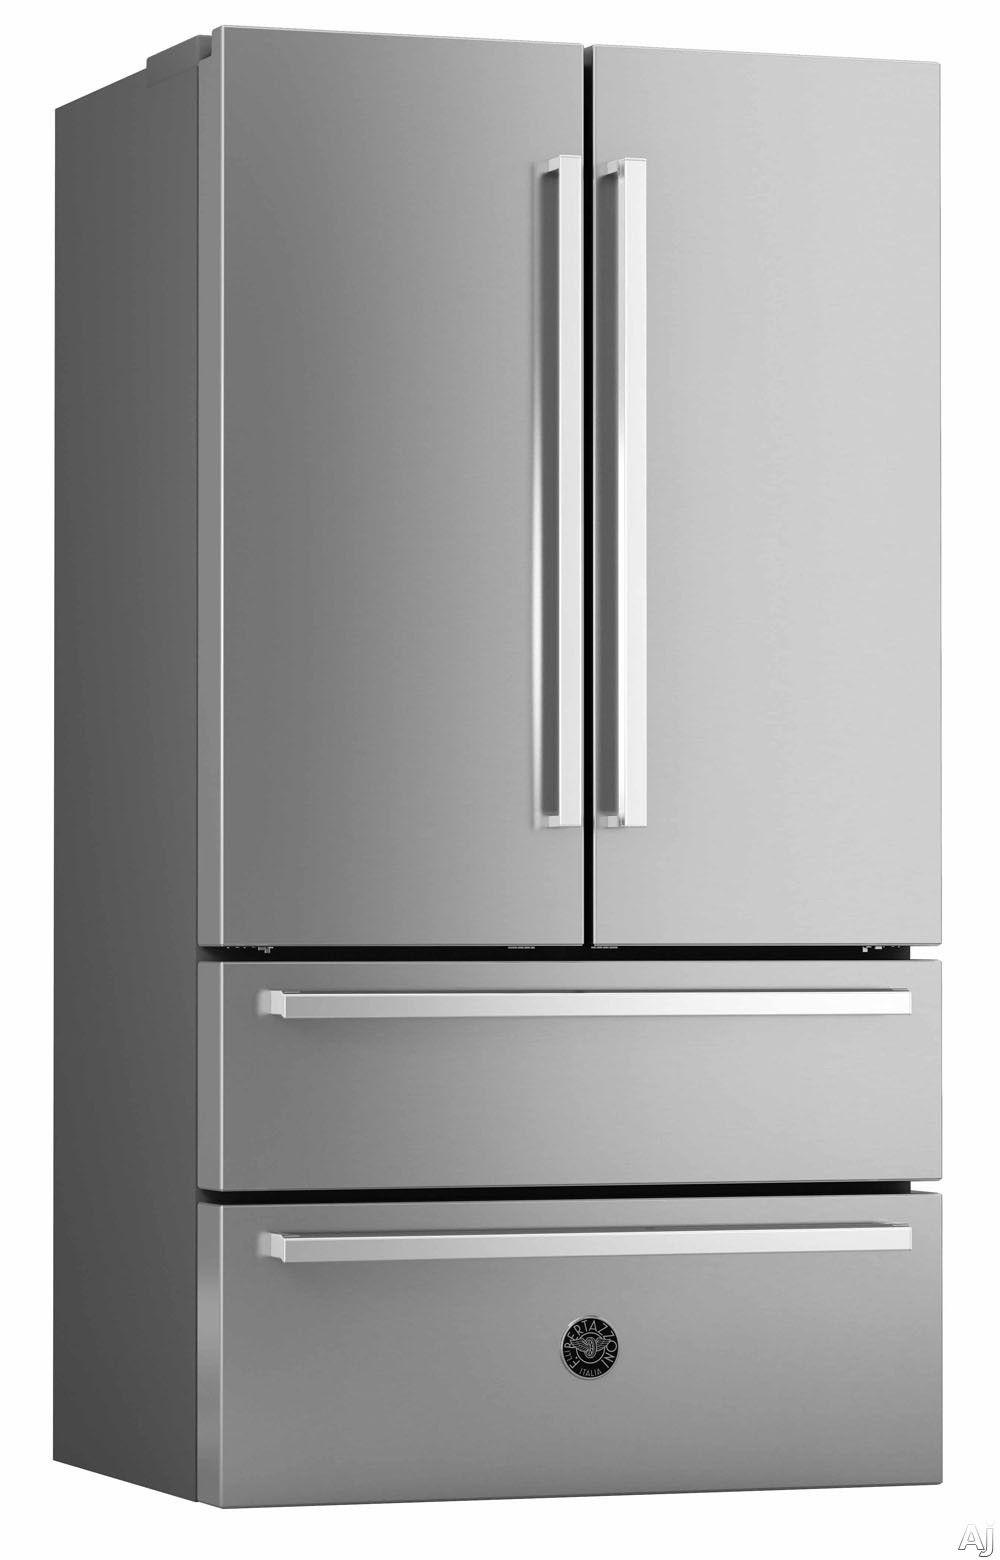 Bertazzoni Professional Series Ref36x French Door Refrigerator French Doors Refrigerator